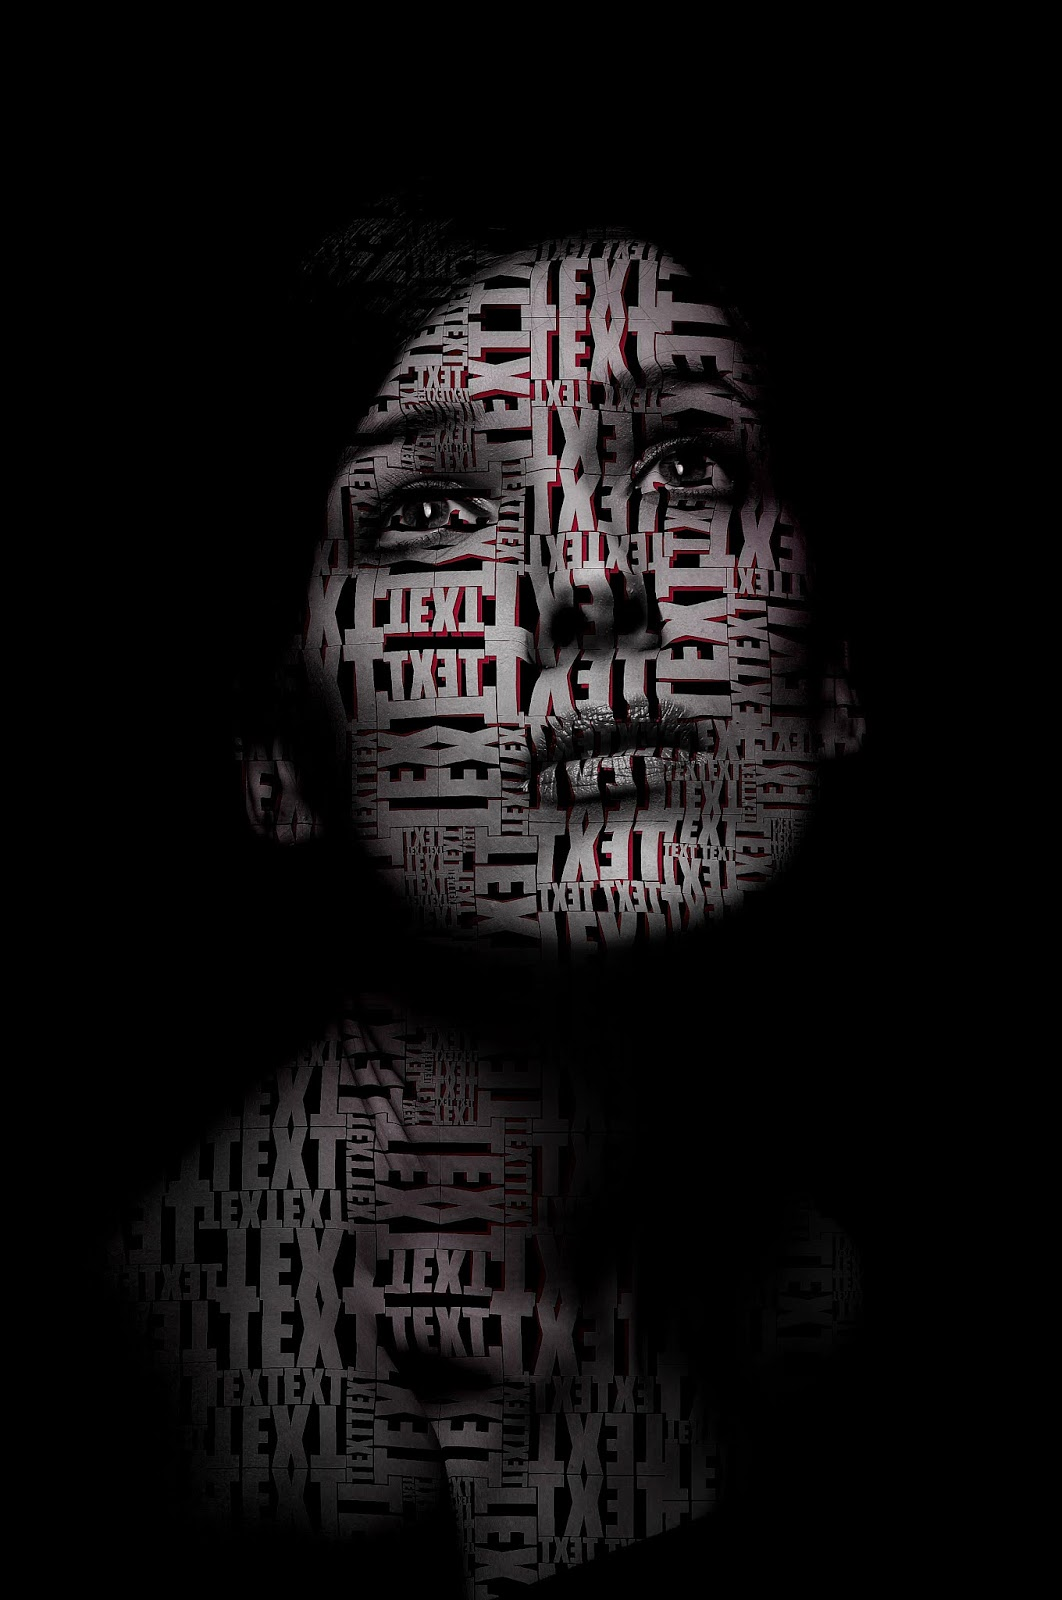 http://2.bp.blogspot.com/-fbaggBSTyLQ/VUJQ8GVty_I/AAAAAAAABh8/0TEx0vJB49g/s1600/ADR_Transform-image-into-a-Text-portrait-BFR%26AFTR-03.jpg